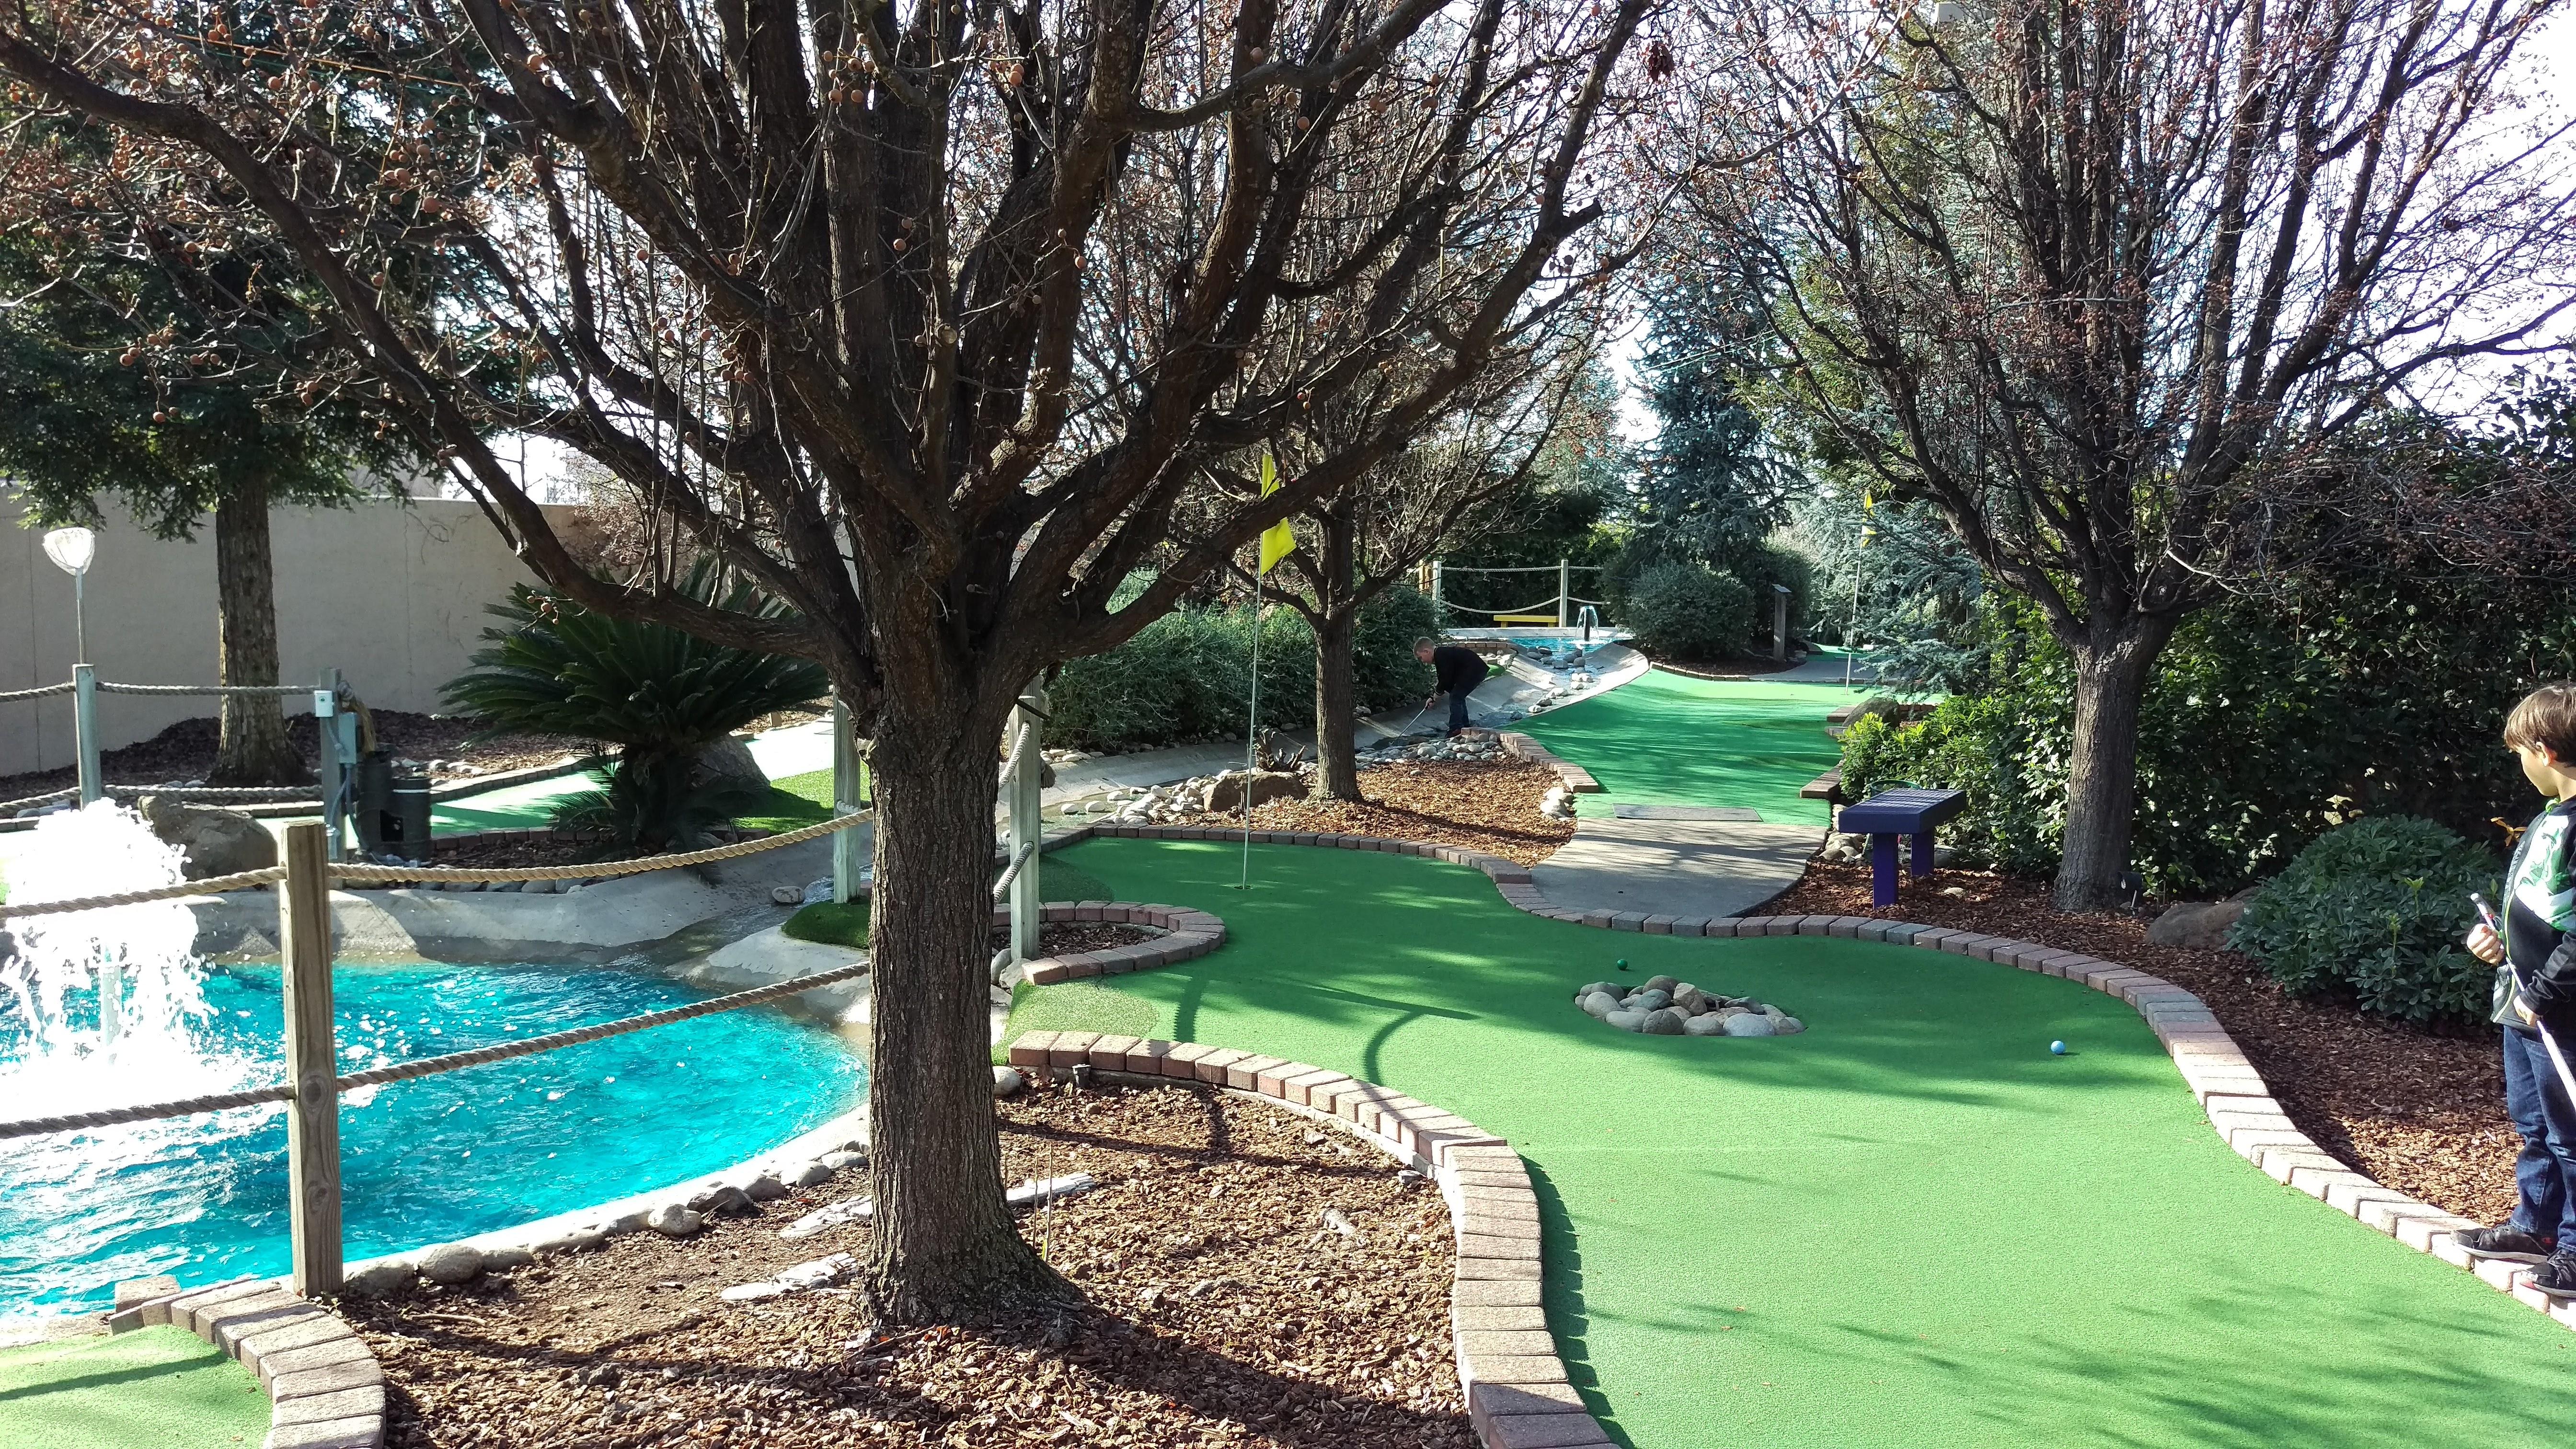 funland miniature golf u2013 where do i take the kids